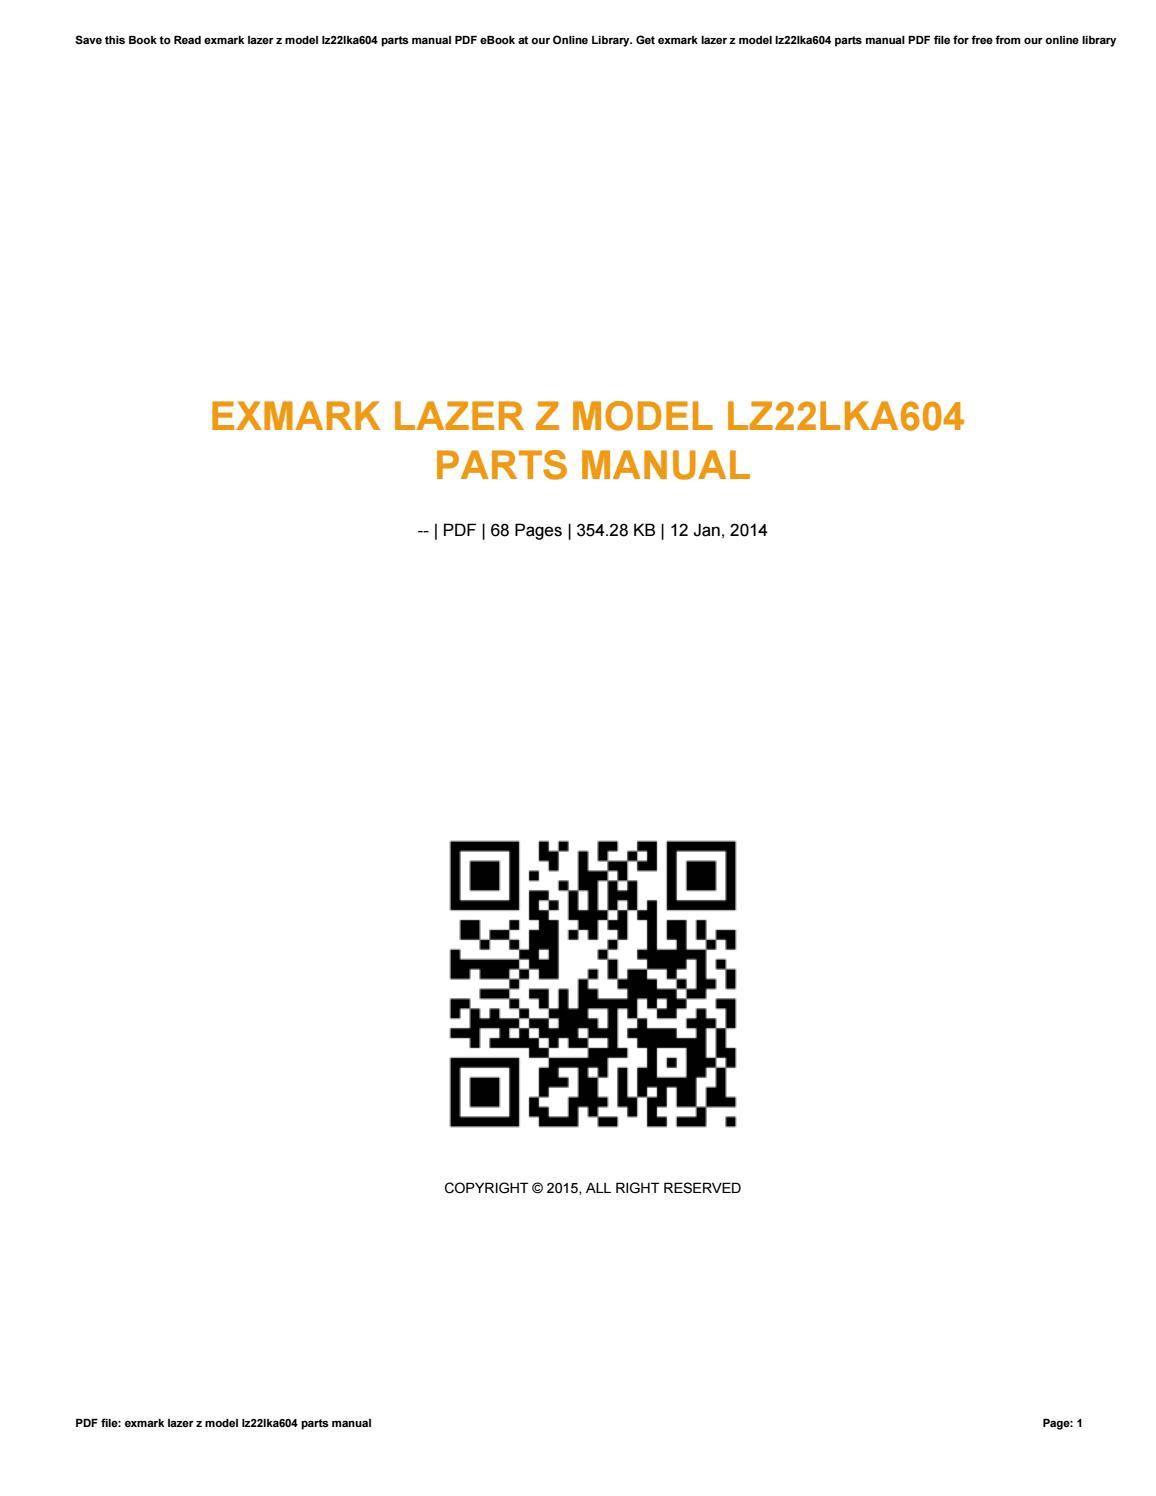 Exmark lazer z model lz22lka604 parts manual by isdaq69